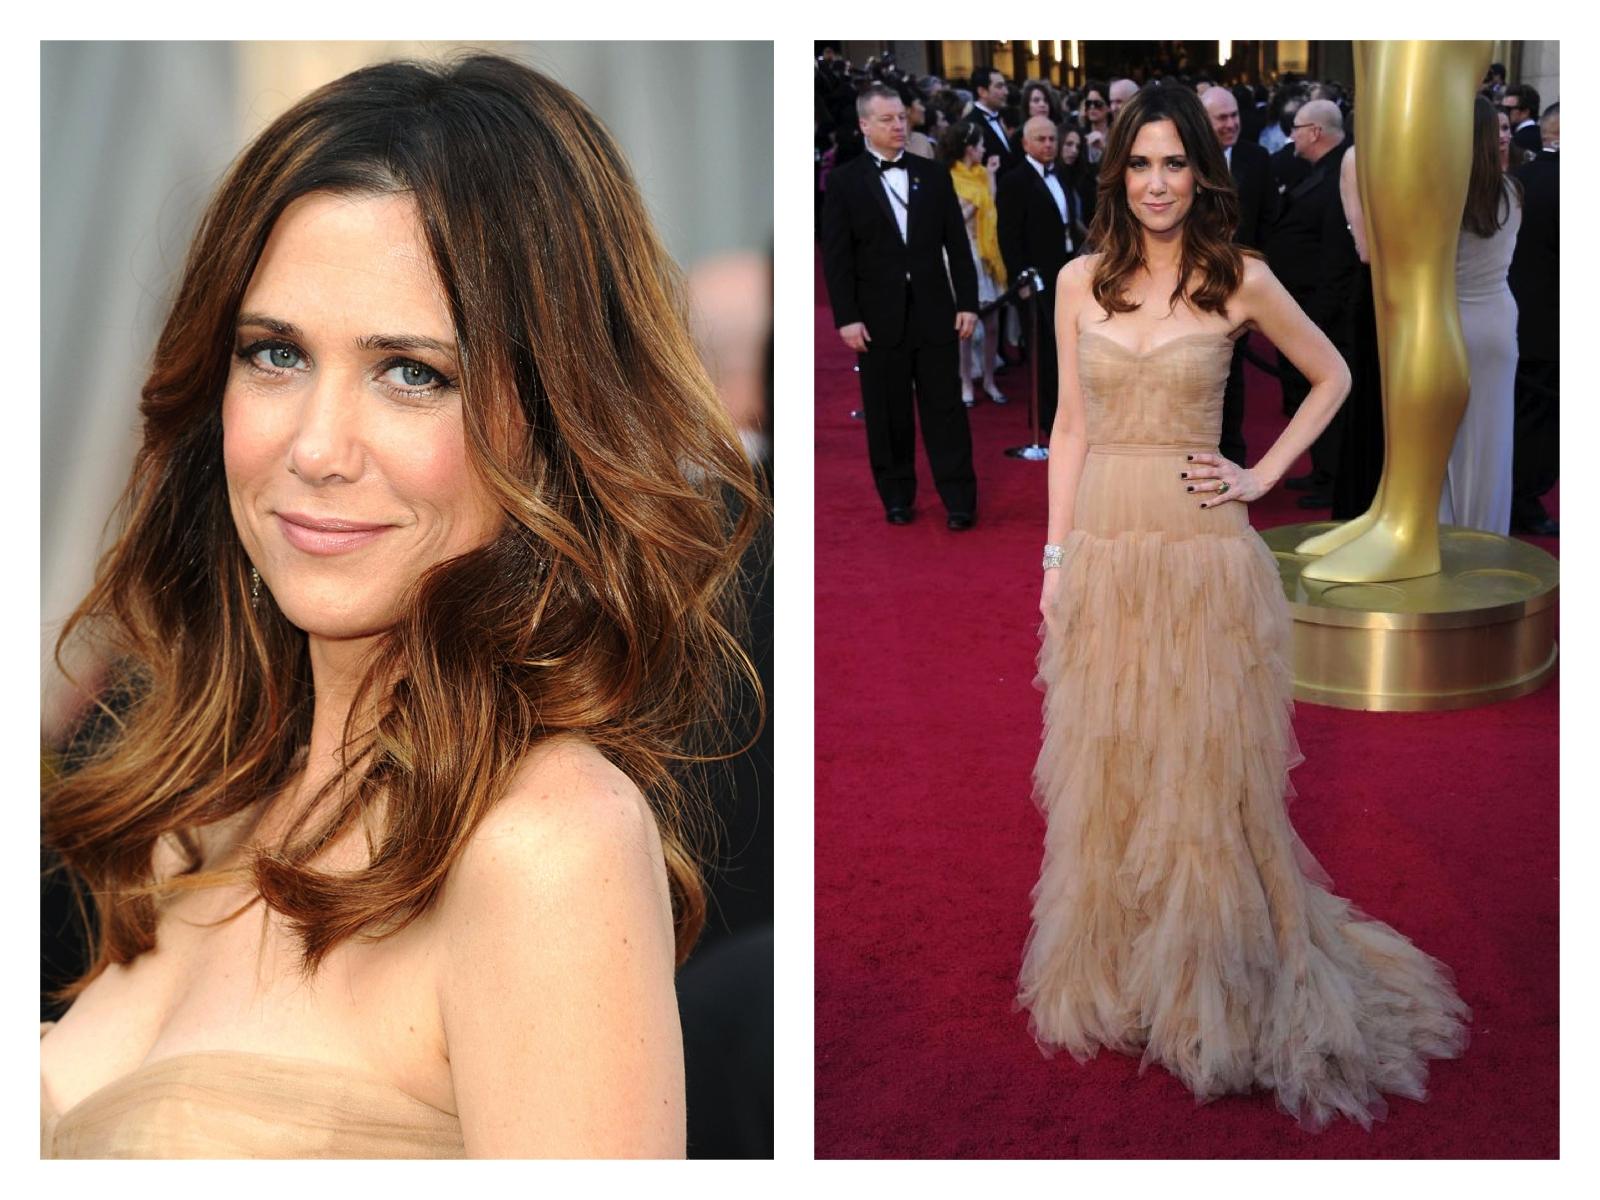 Kristen Wiig/Oscars Red Carpet